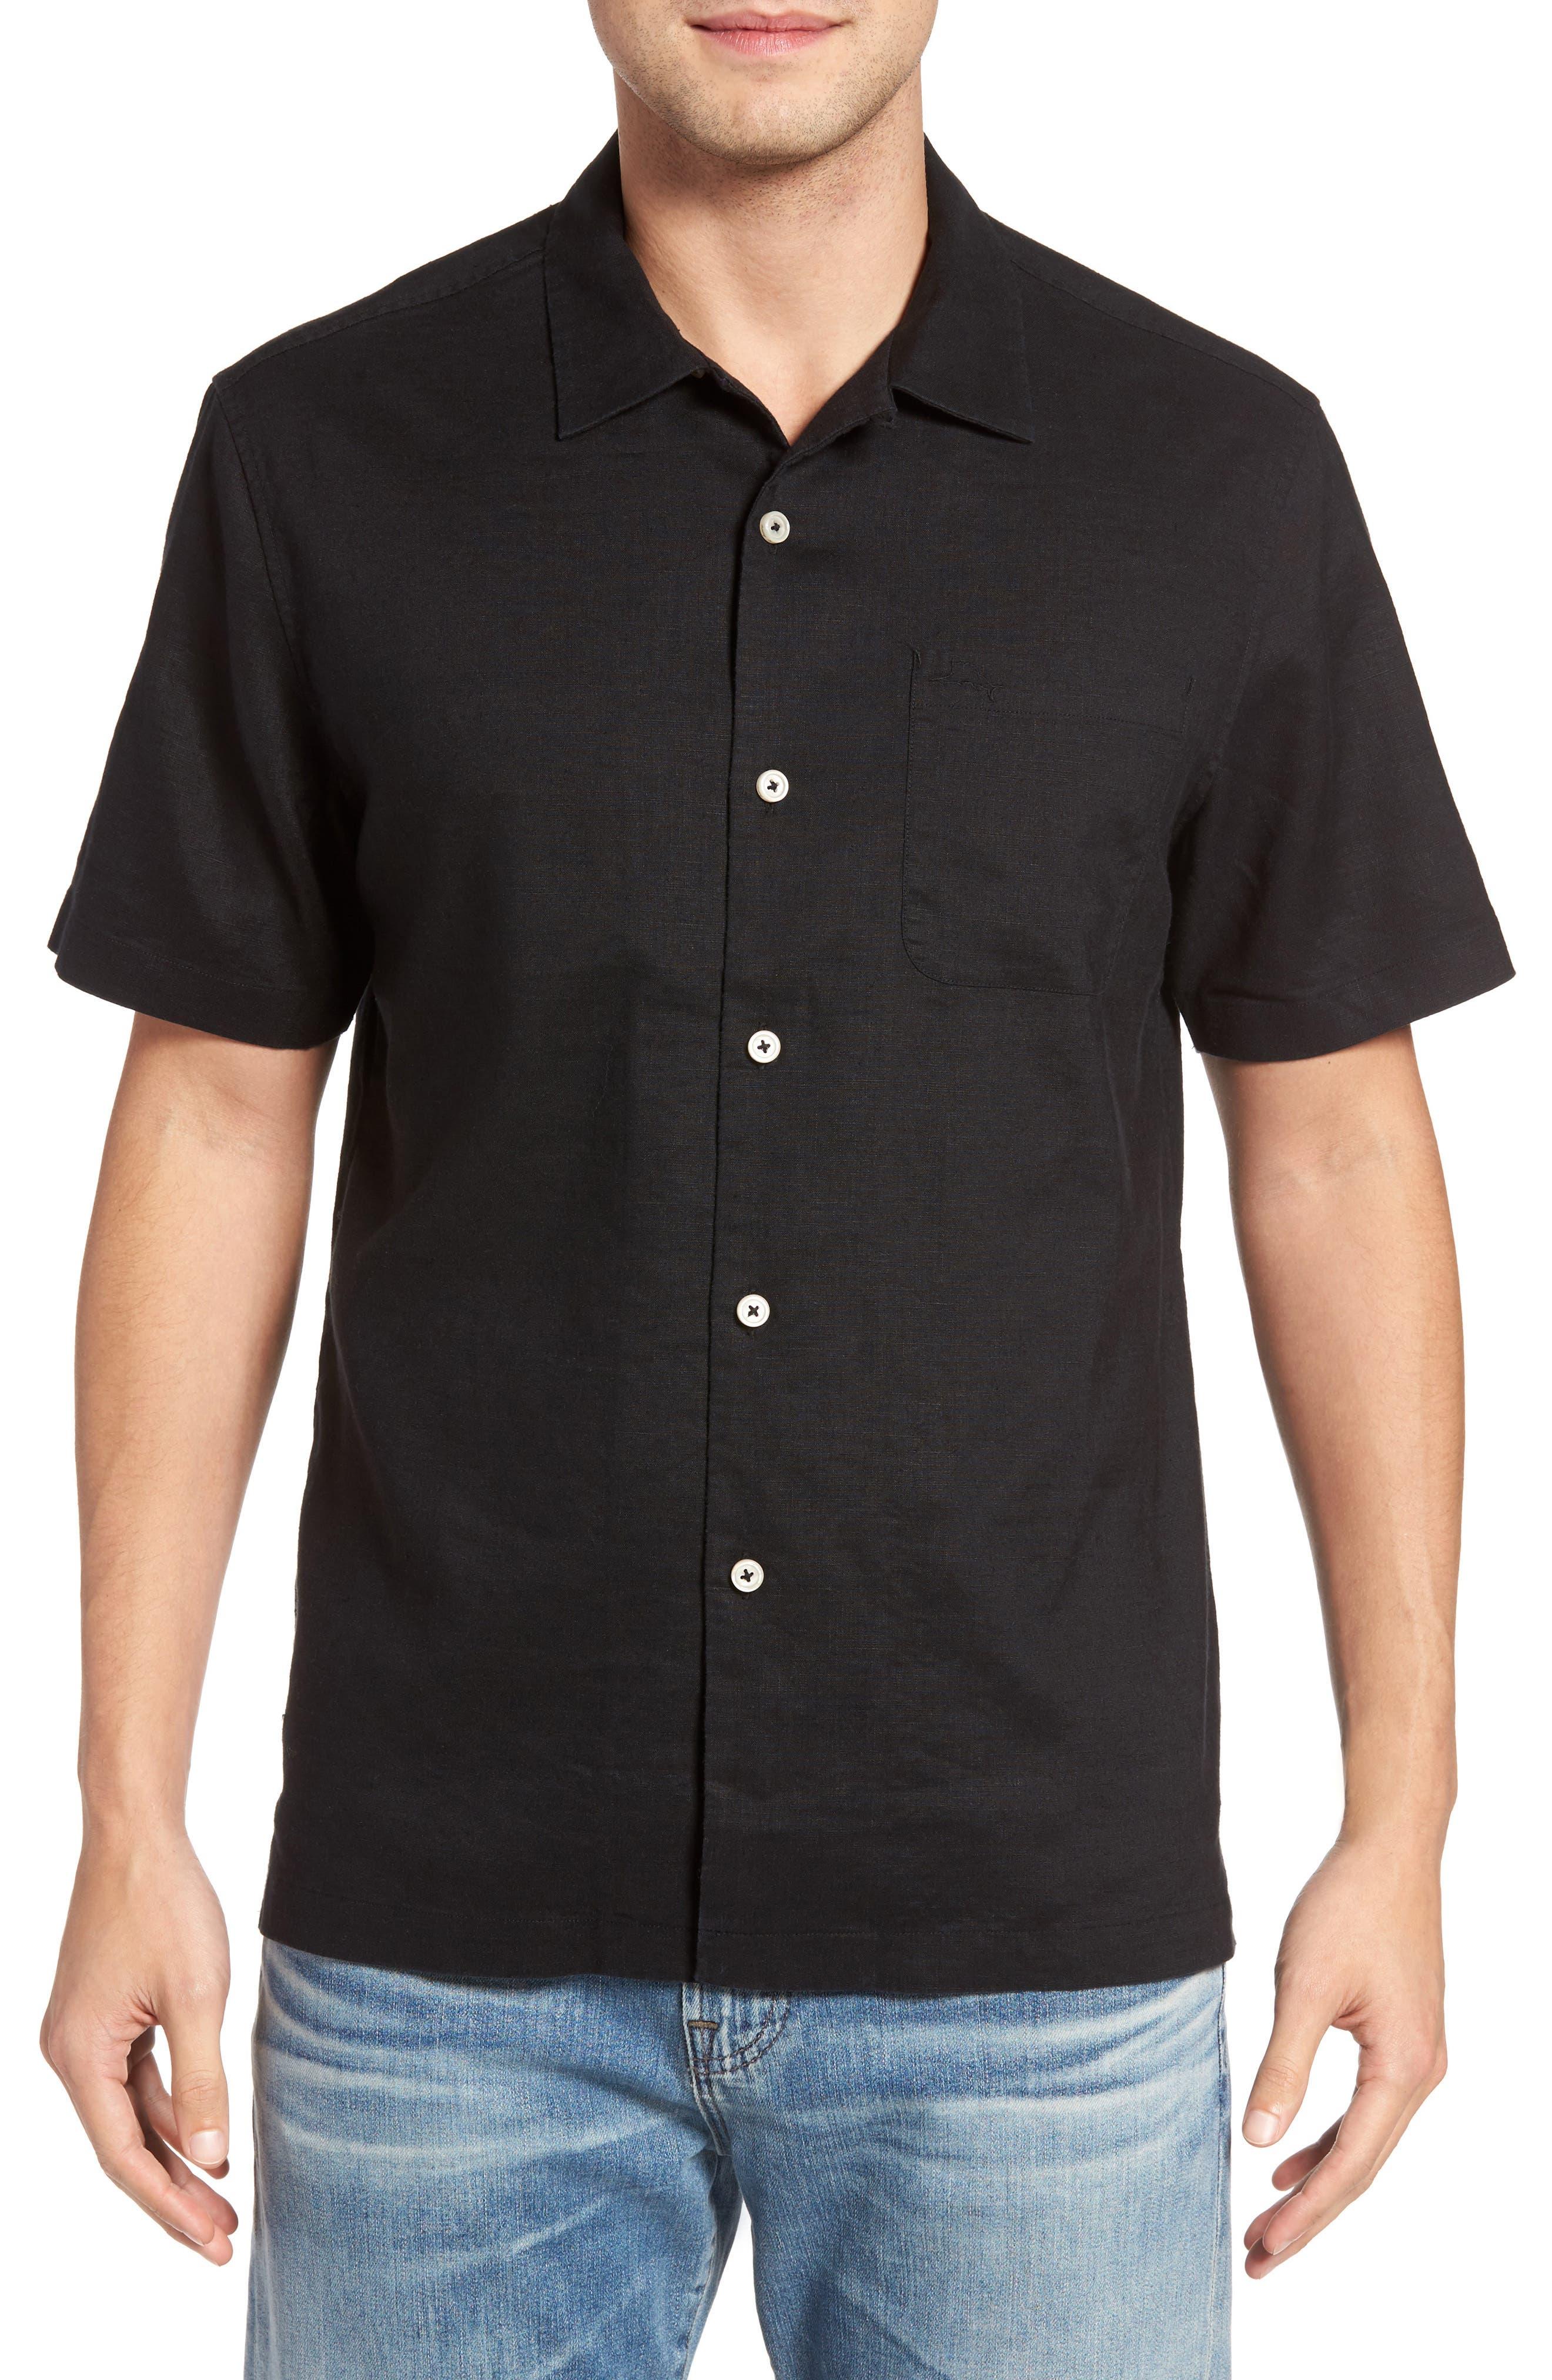 Alternate Image 1 Selected - Tommy Bahama Monaco Tides Standard Fit Linen Blend Camp Shirt